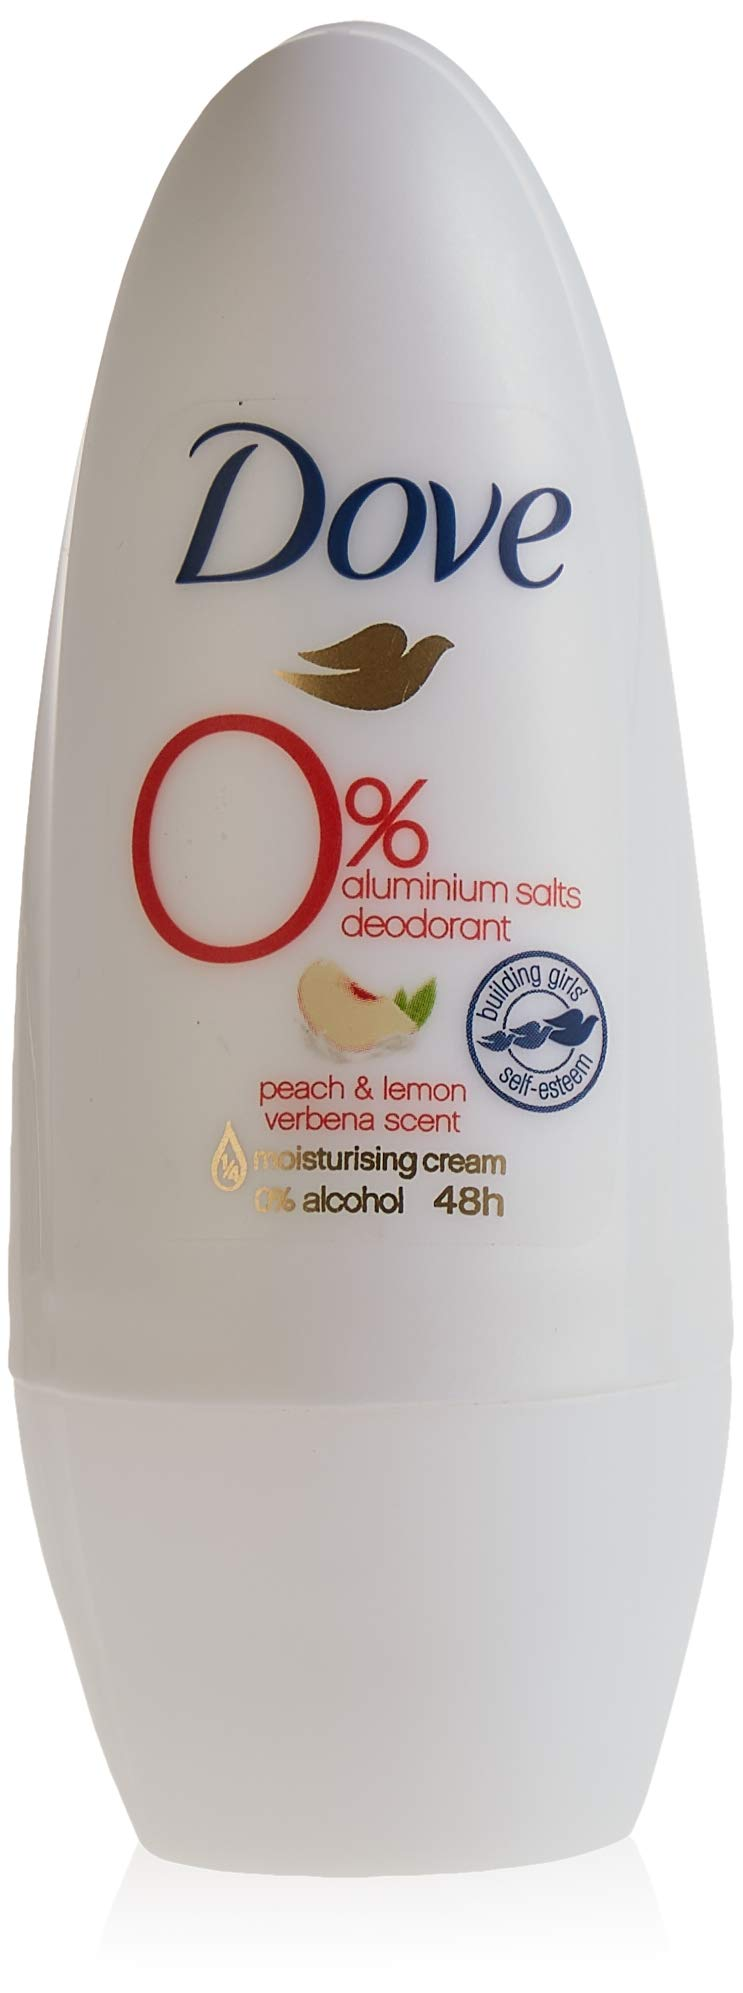 Dove Desodorante 0% Melocotón Roll On - 50 ml